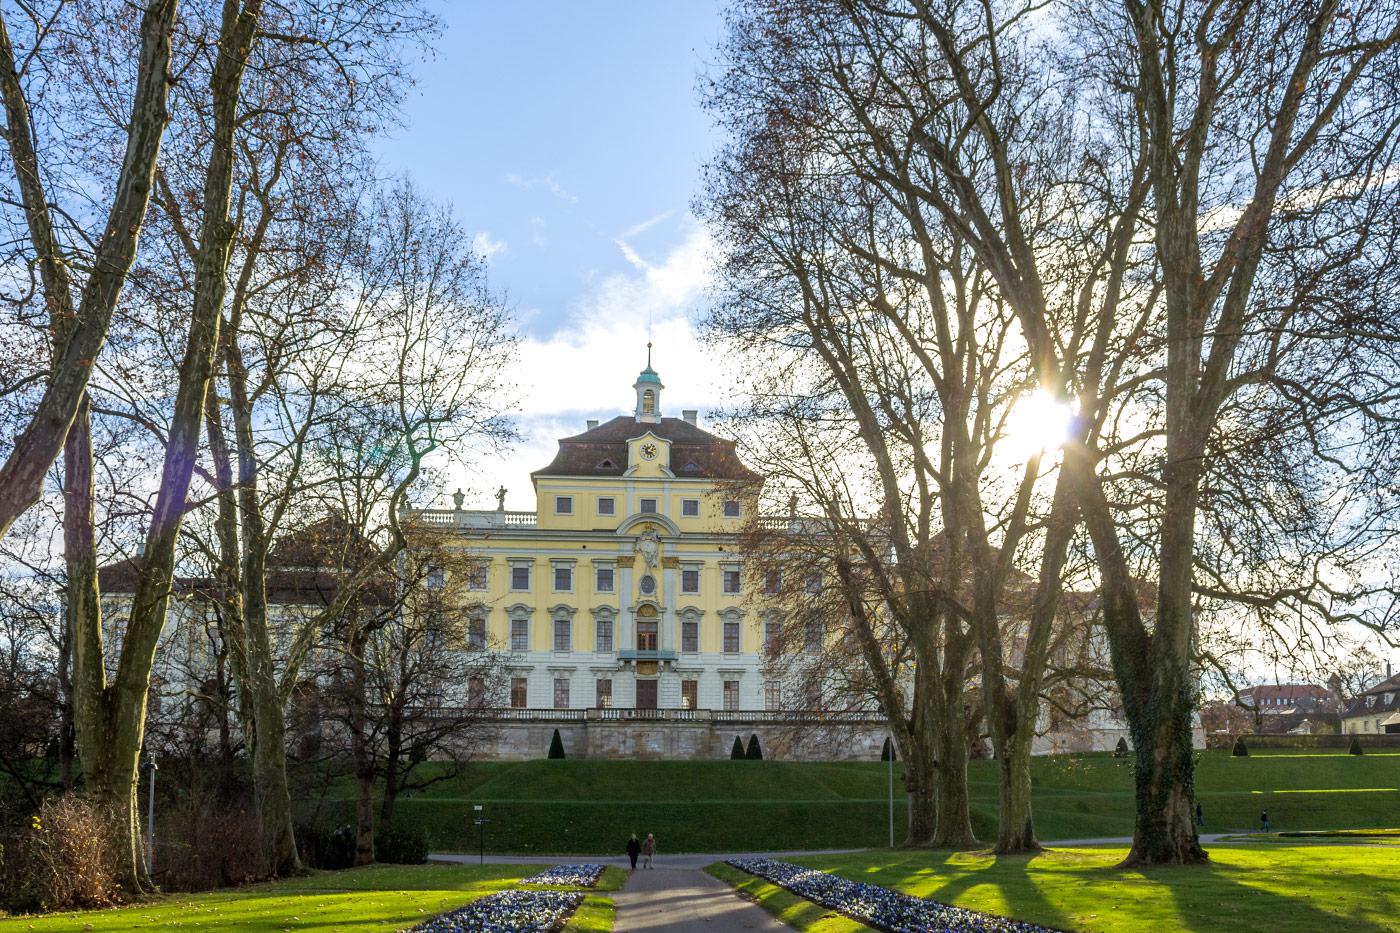 Ludwigsburg Residenz im Herbst